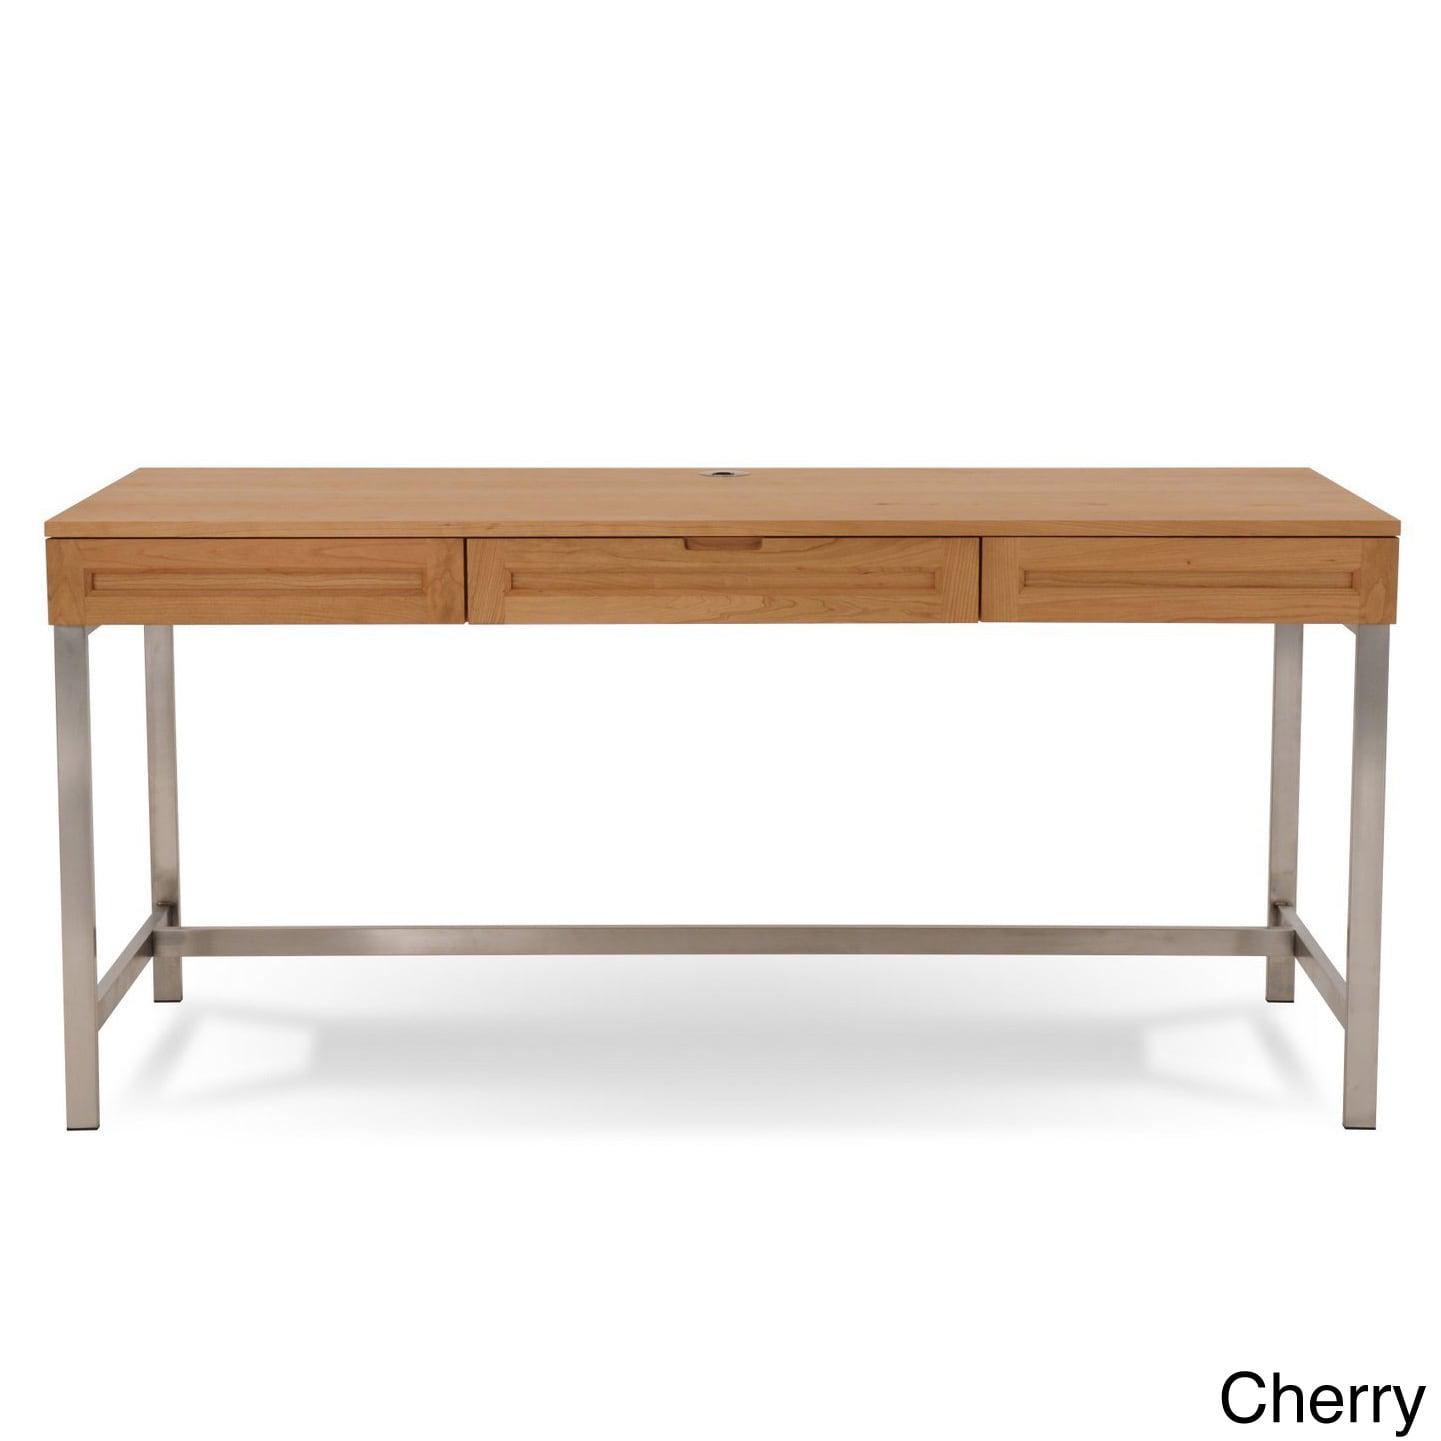 Shop Jesper Office Highland 64 Inch Solid Wood Desk Free Shipping